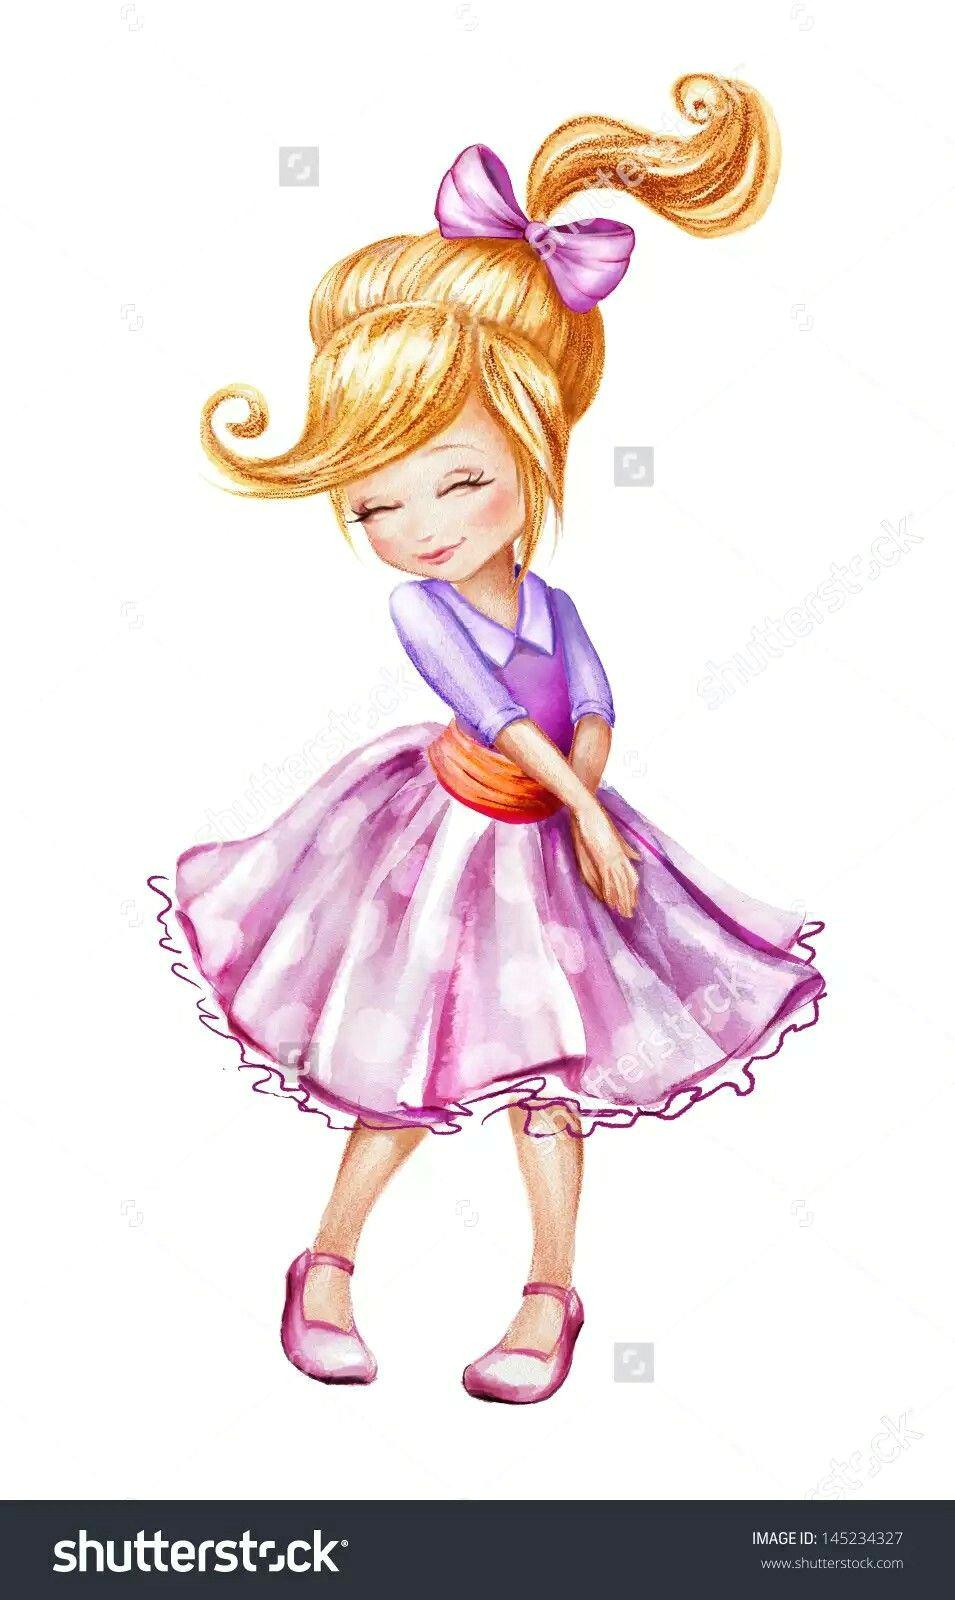 discover ideas about sweet girls cute beautiful shy little girl cartoon